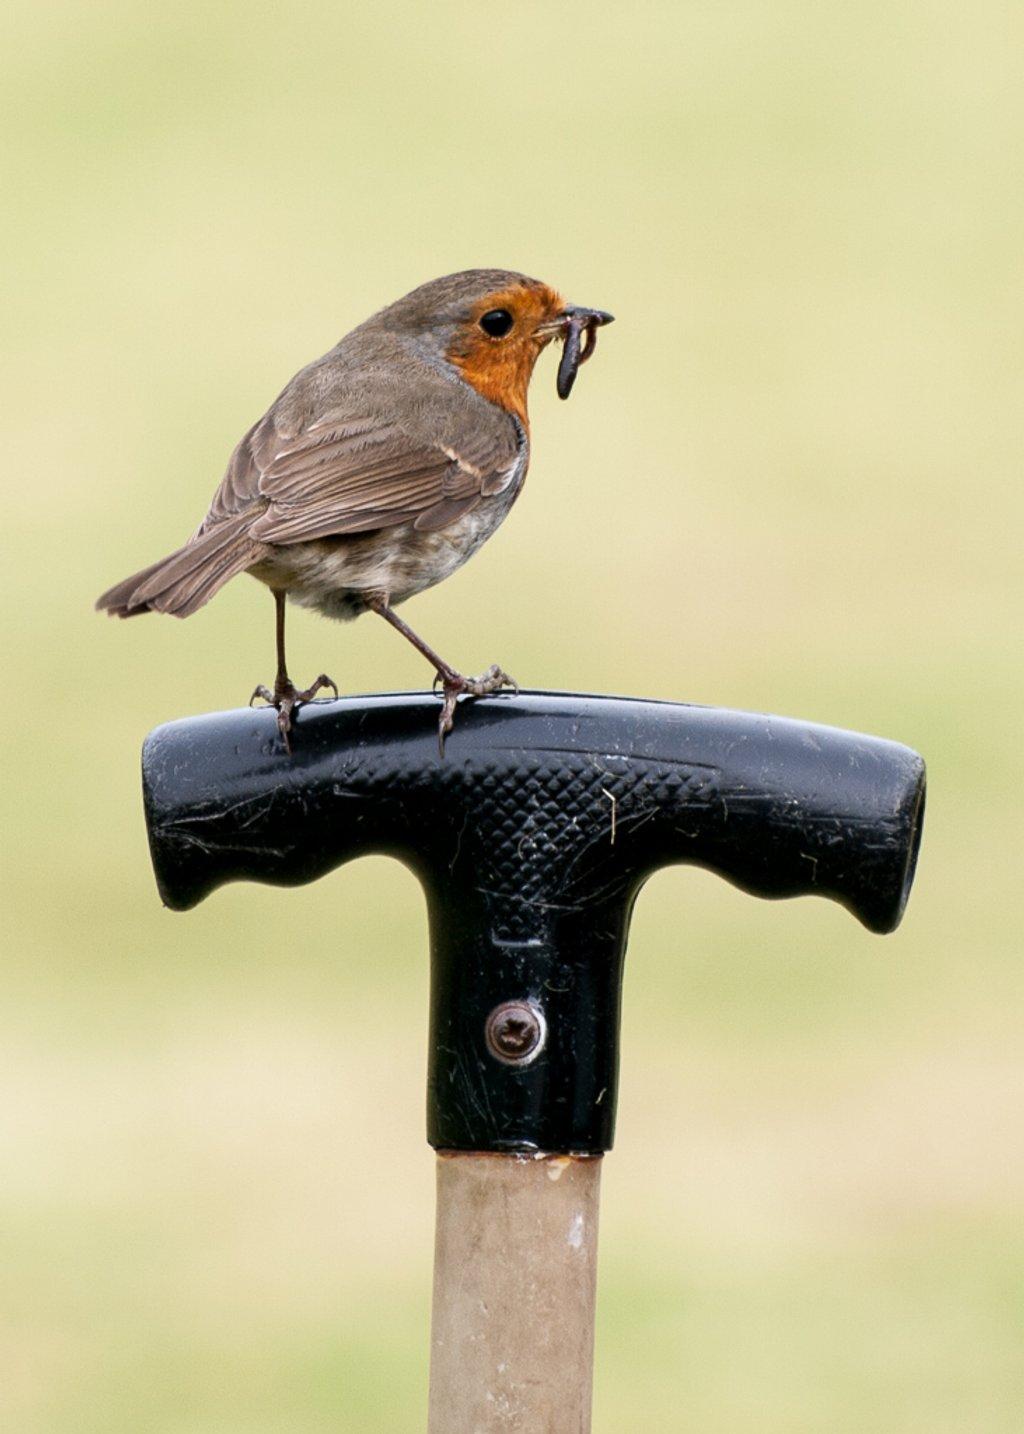 Home bird - 5-05 by barrowlane